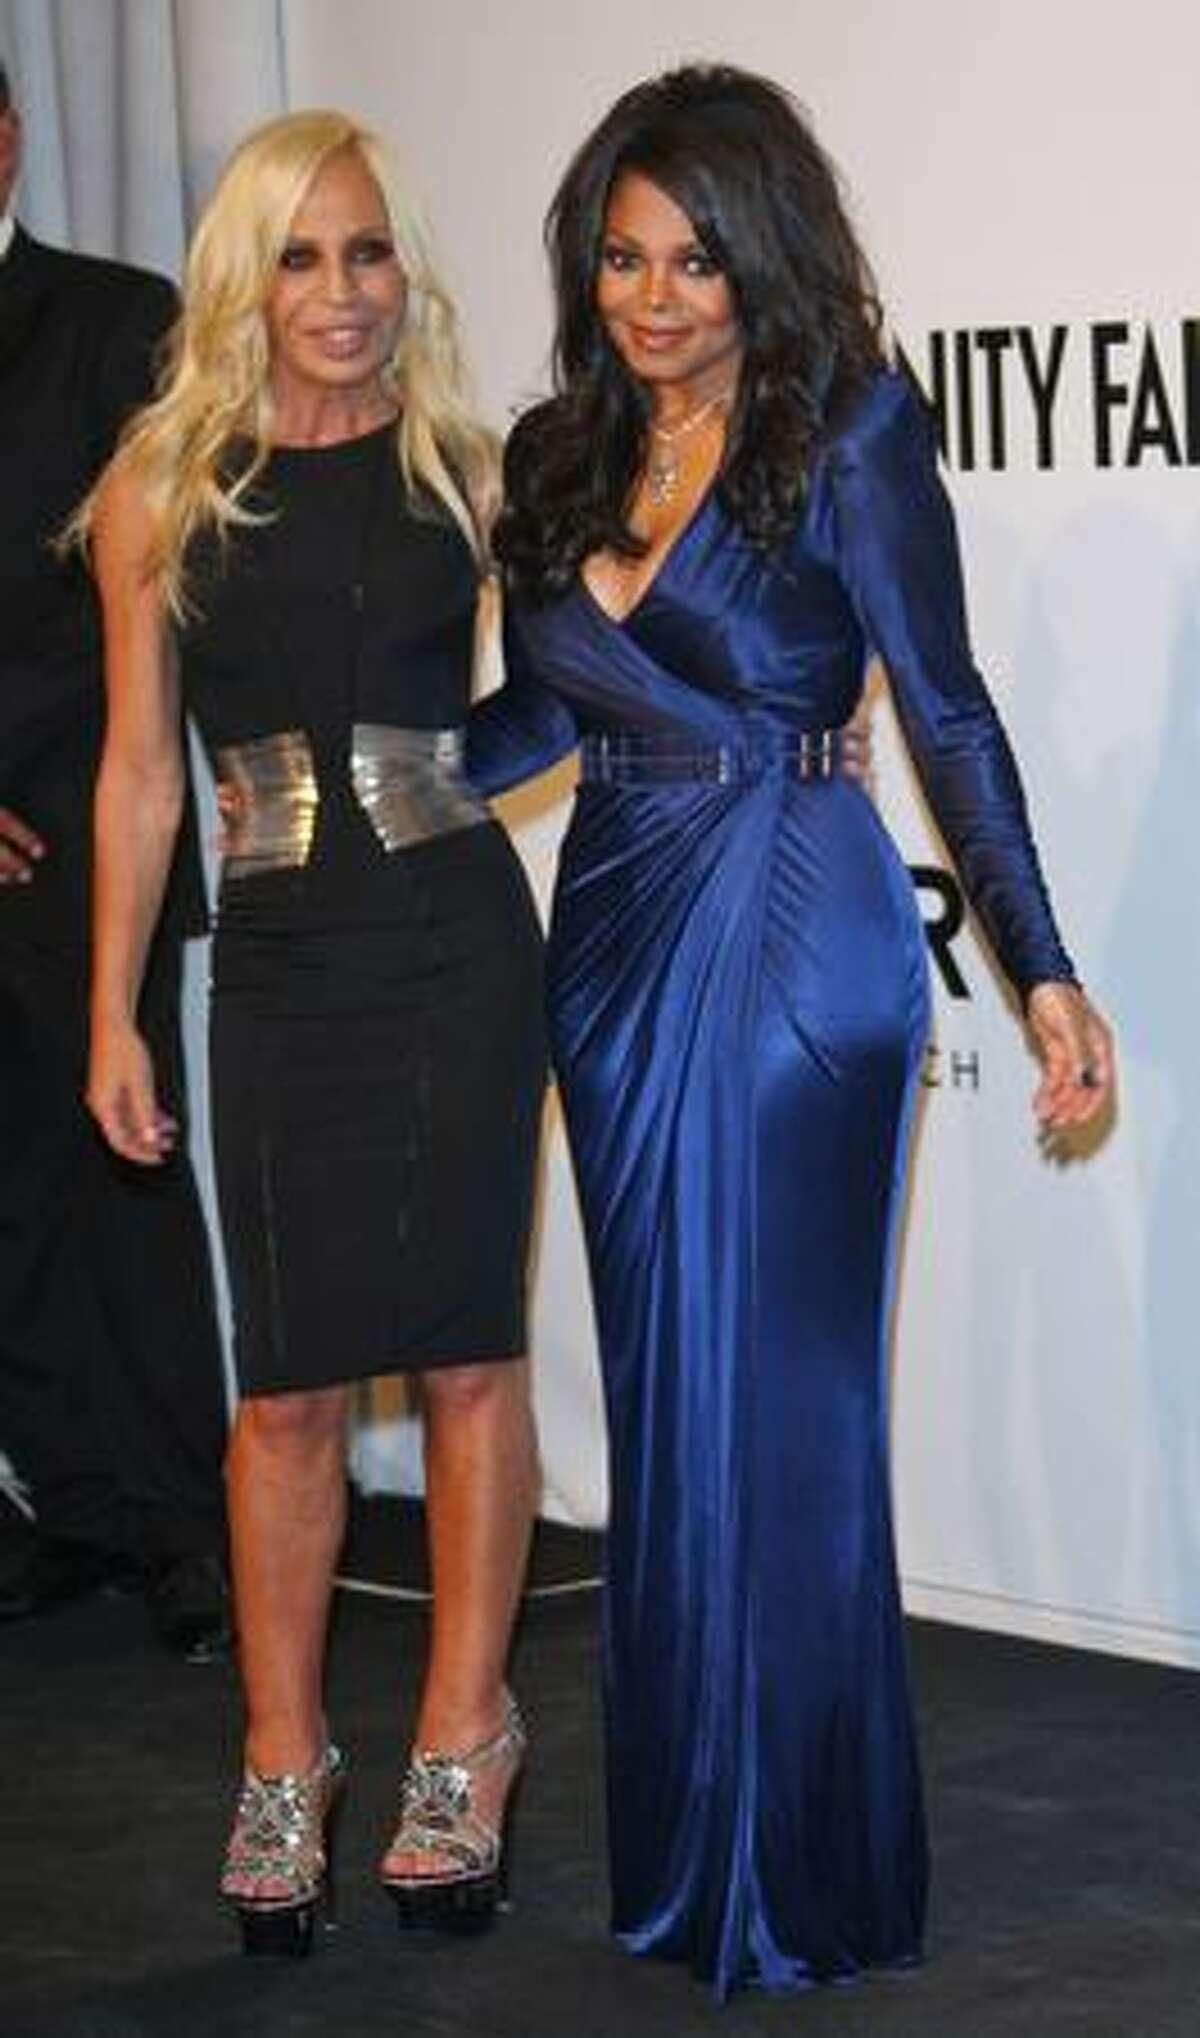 Designer Donatella Versace and Janet Jackson arrive.